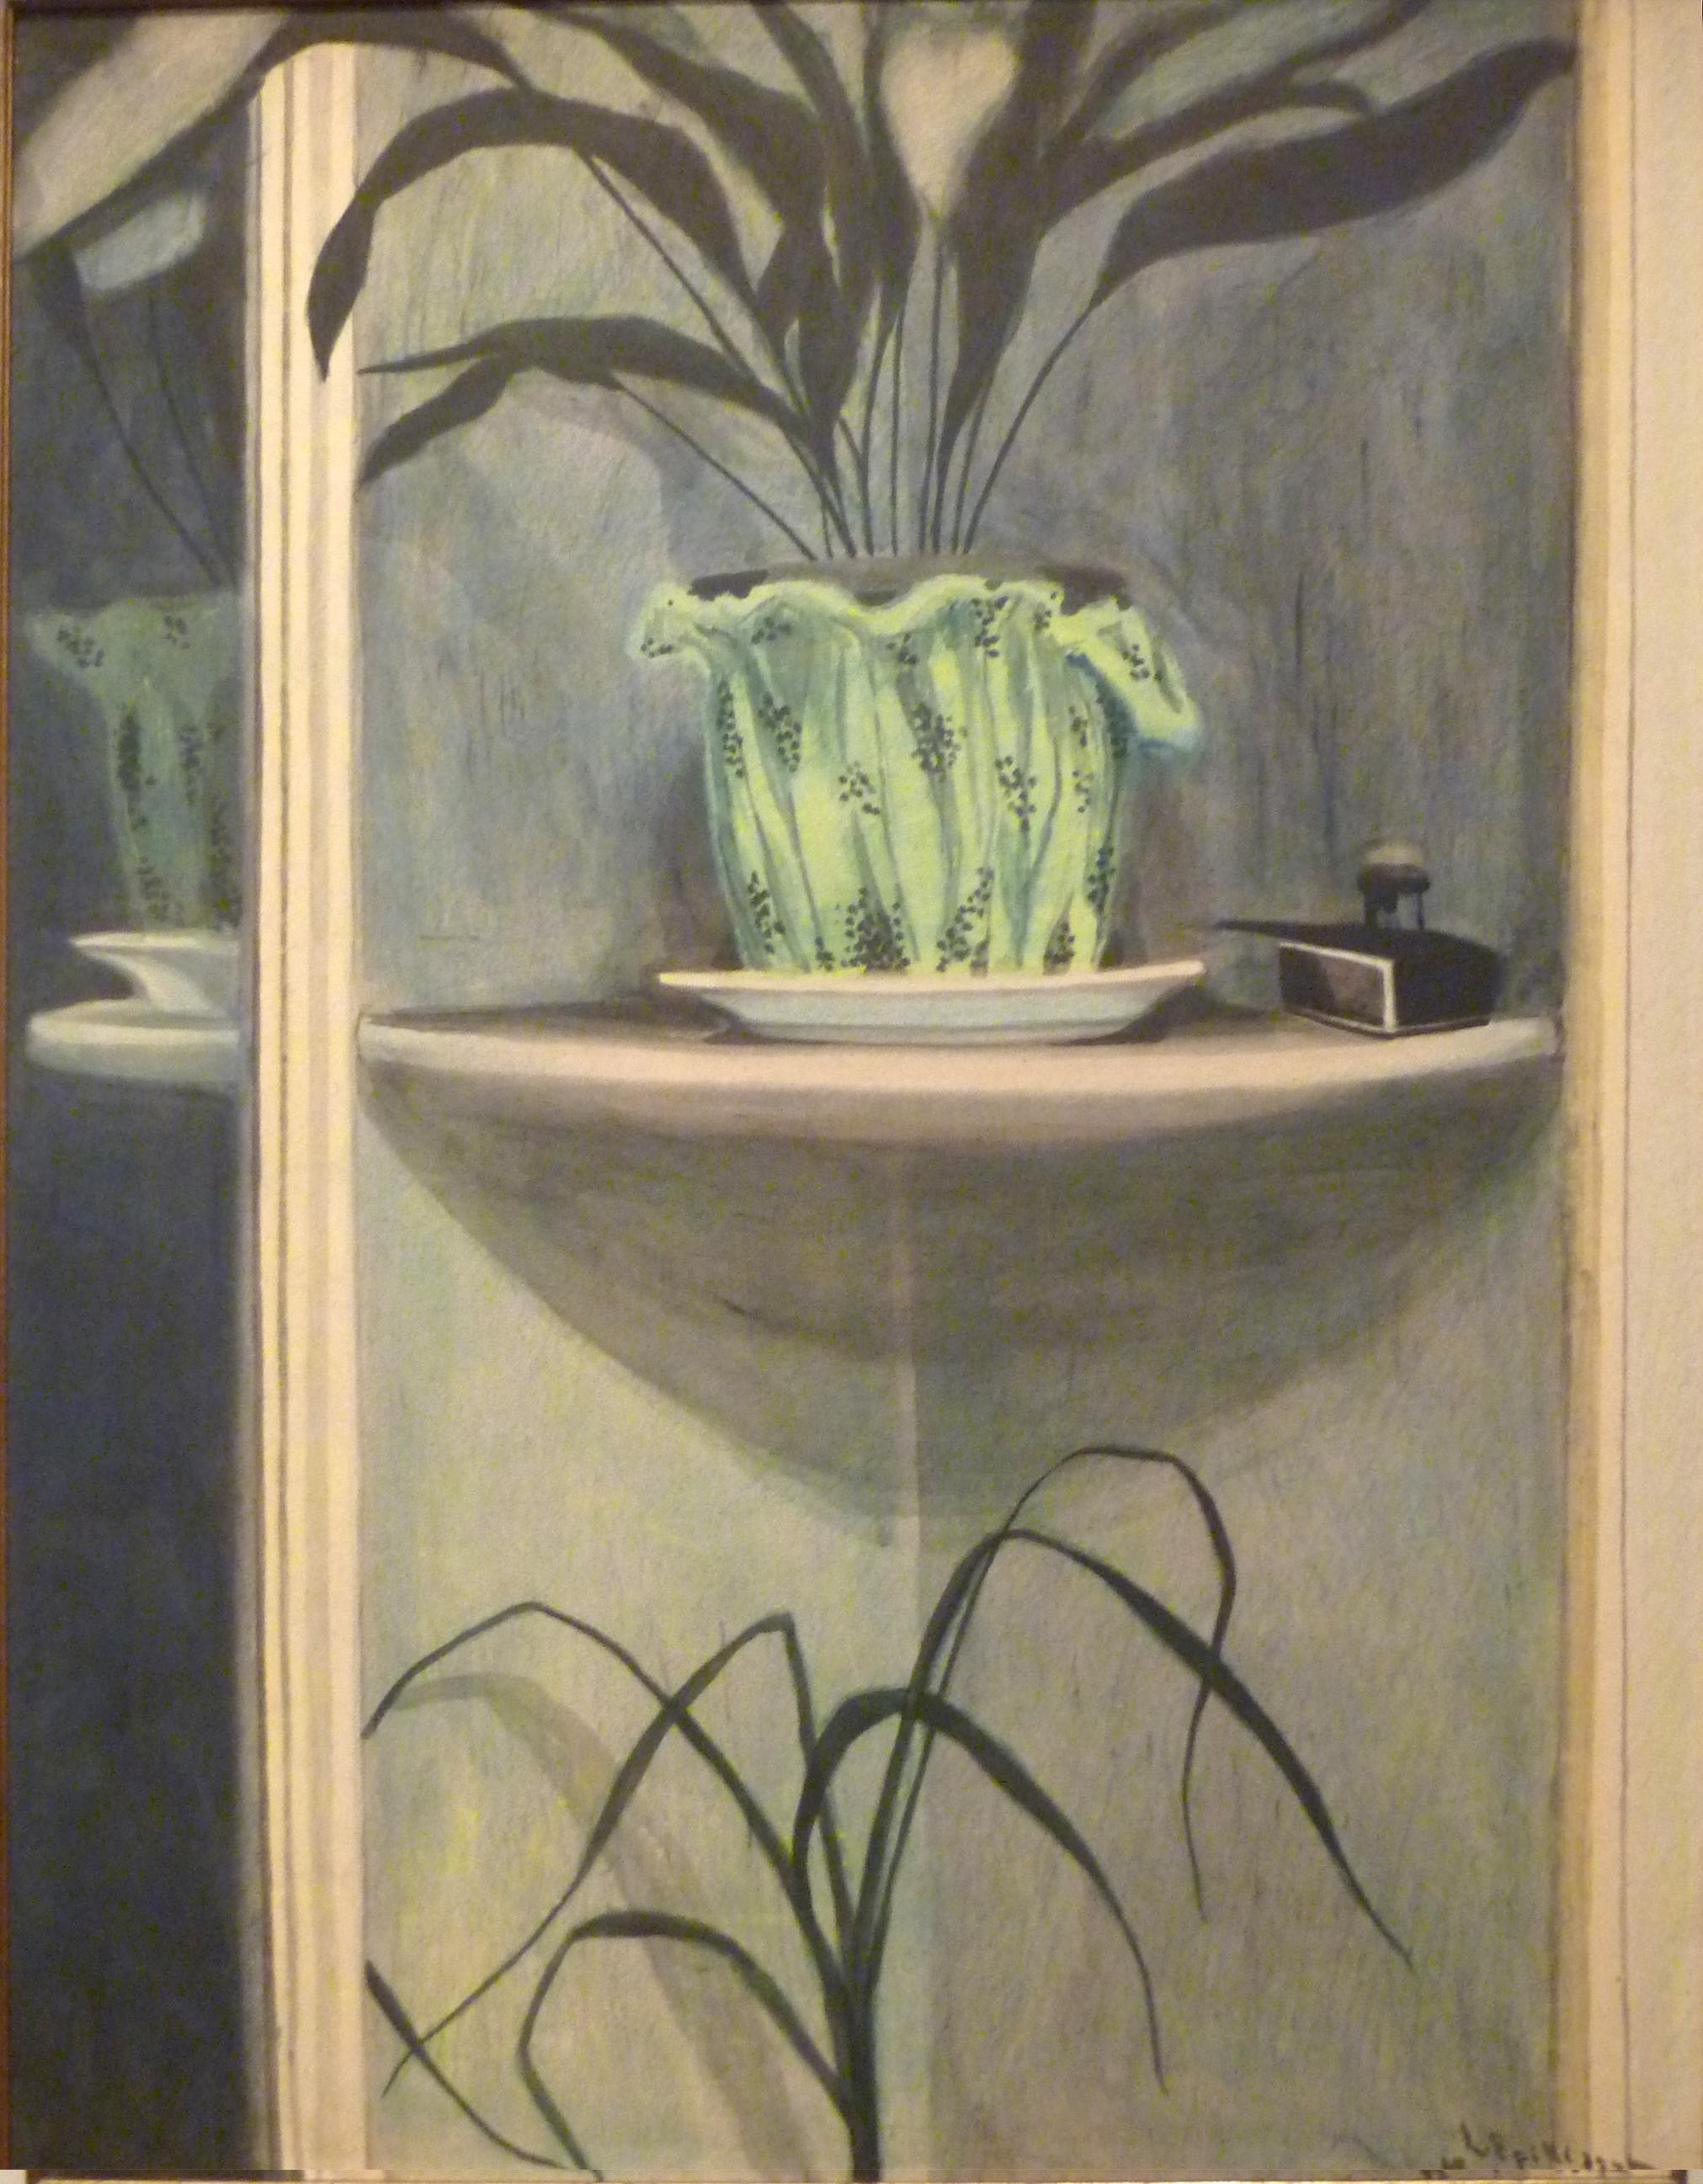 File l on spilliaert 1908 planten inktpot en spiegel for Spiegel history